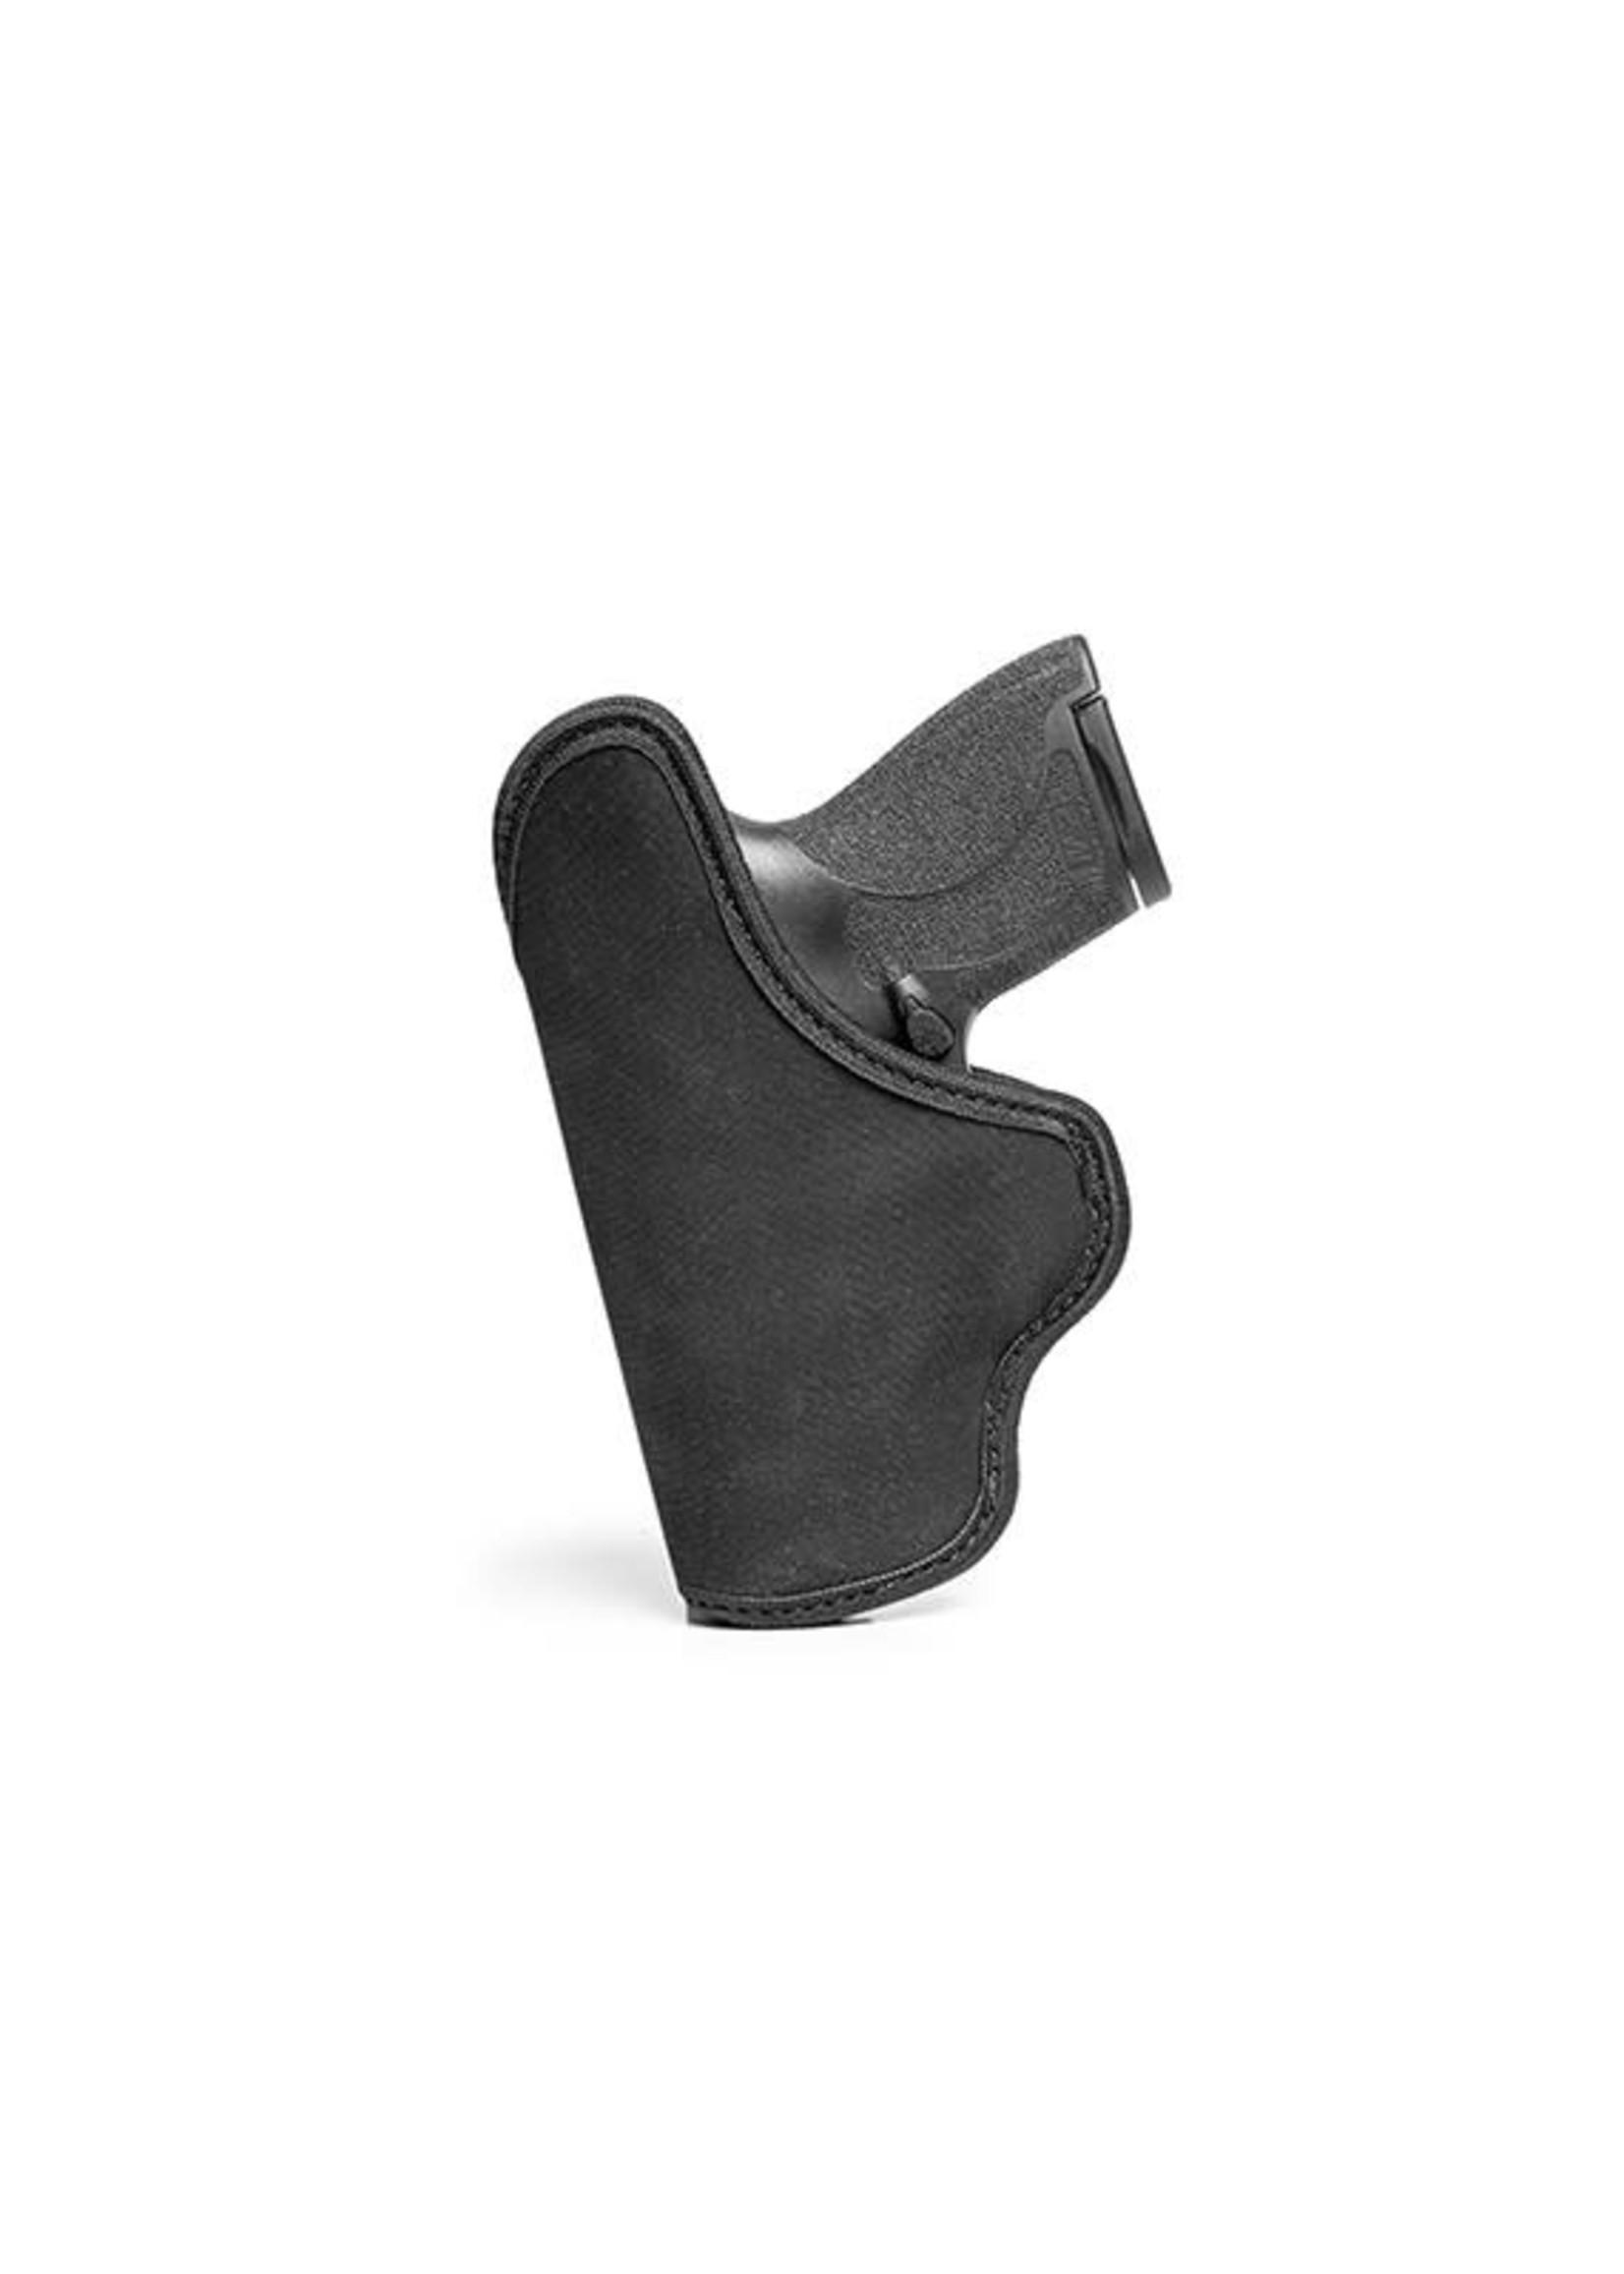 Alien Gear Holsters Alien Gear Grip Tuck Universal Holster - Subcompact, RH, Double Stack